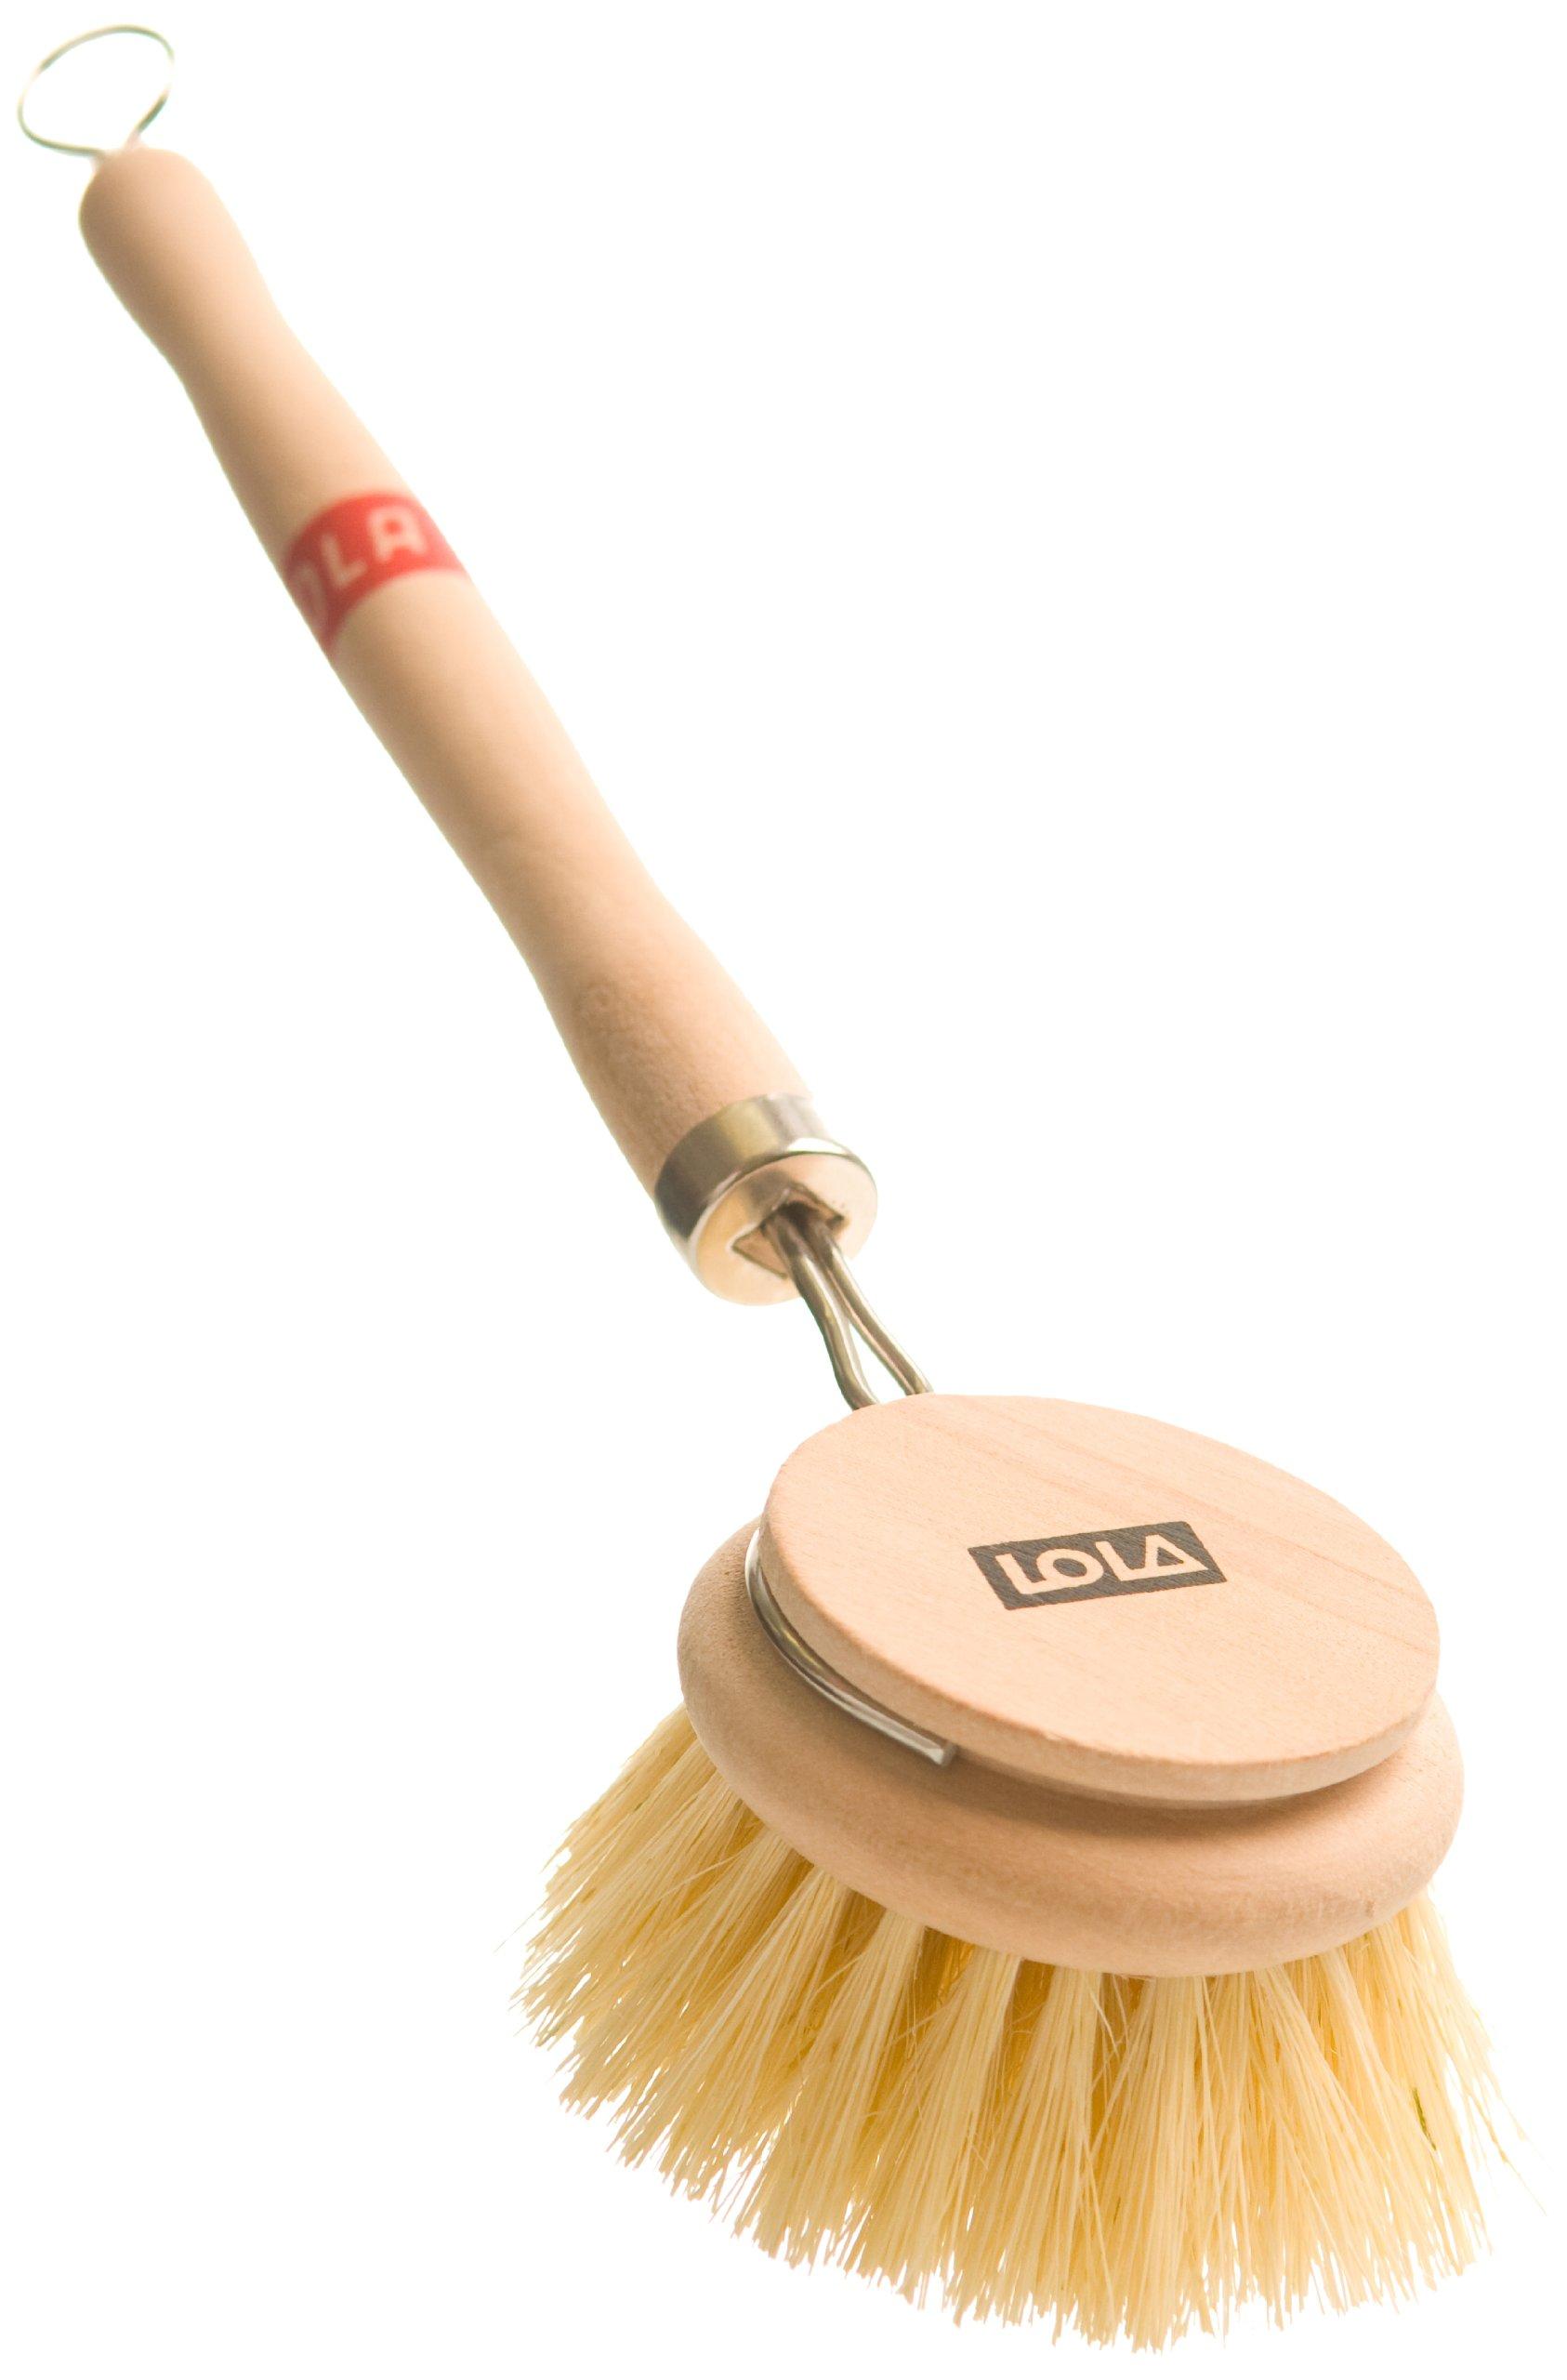 Lola 325 Large Tampico Bristle Wood Vegetable and Dish Brush, 6-Pack